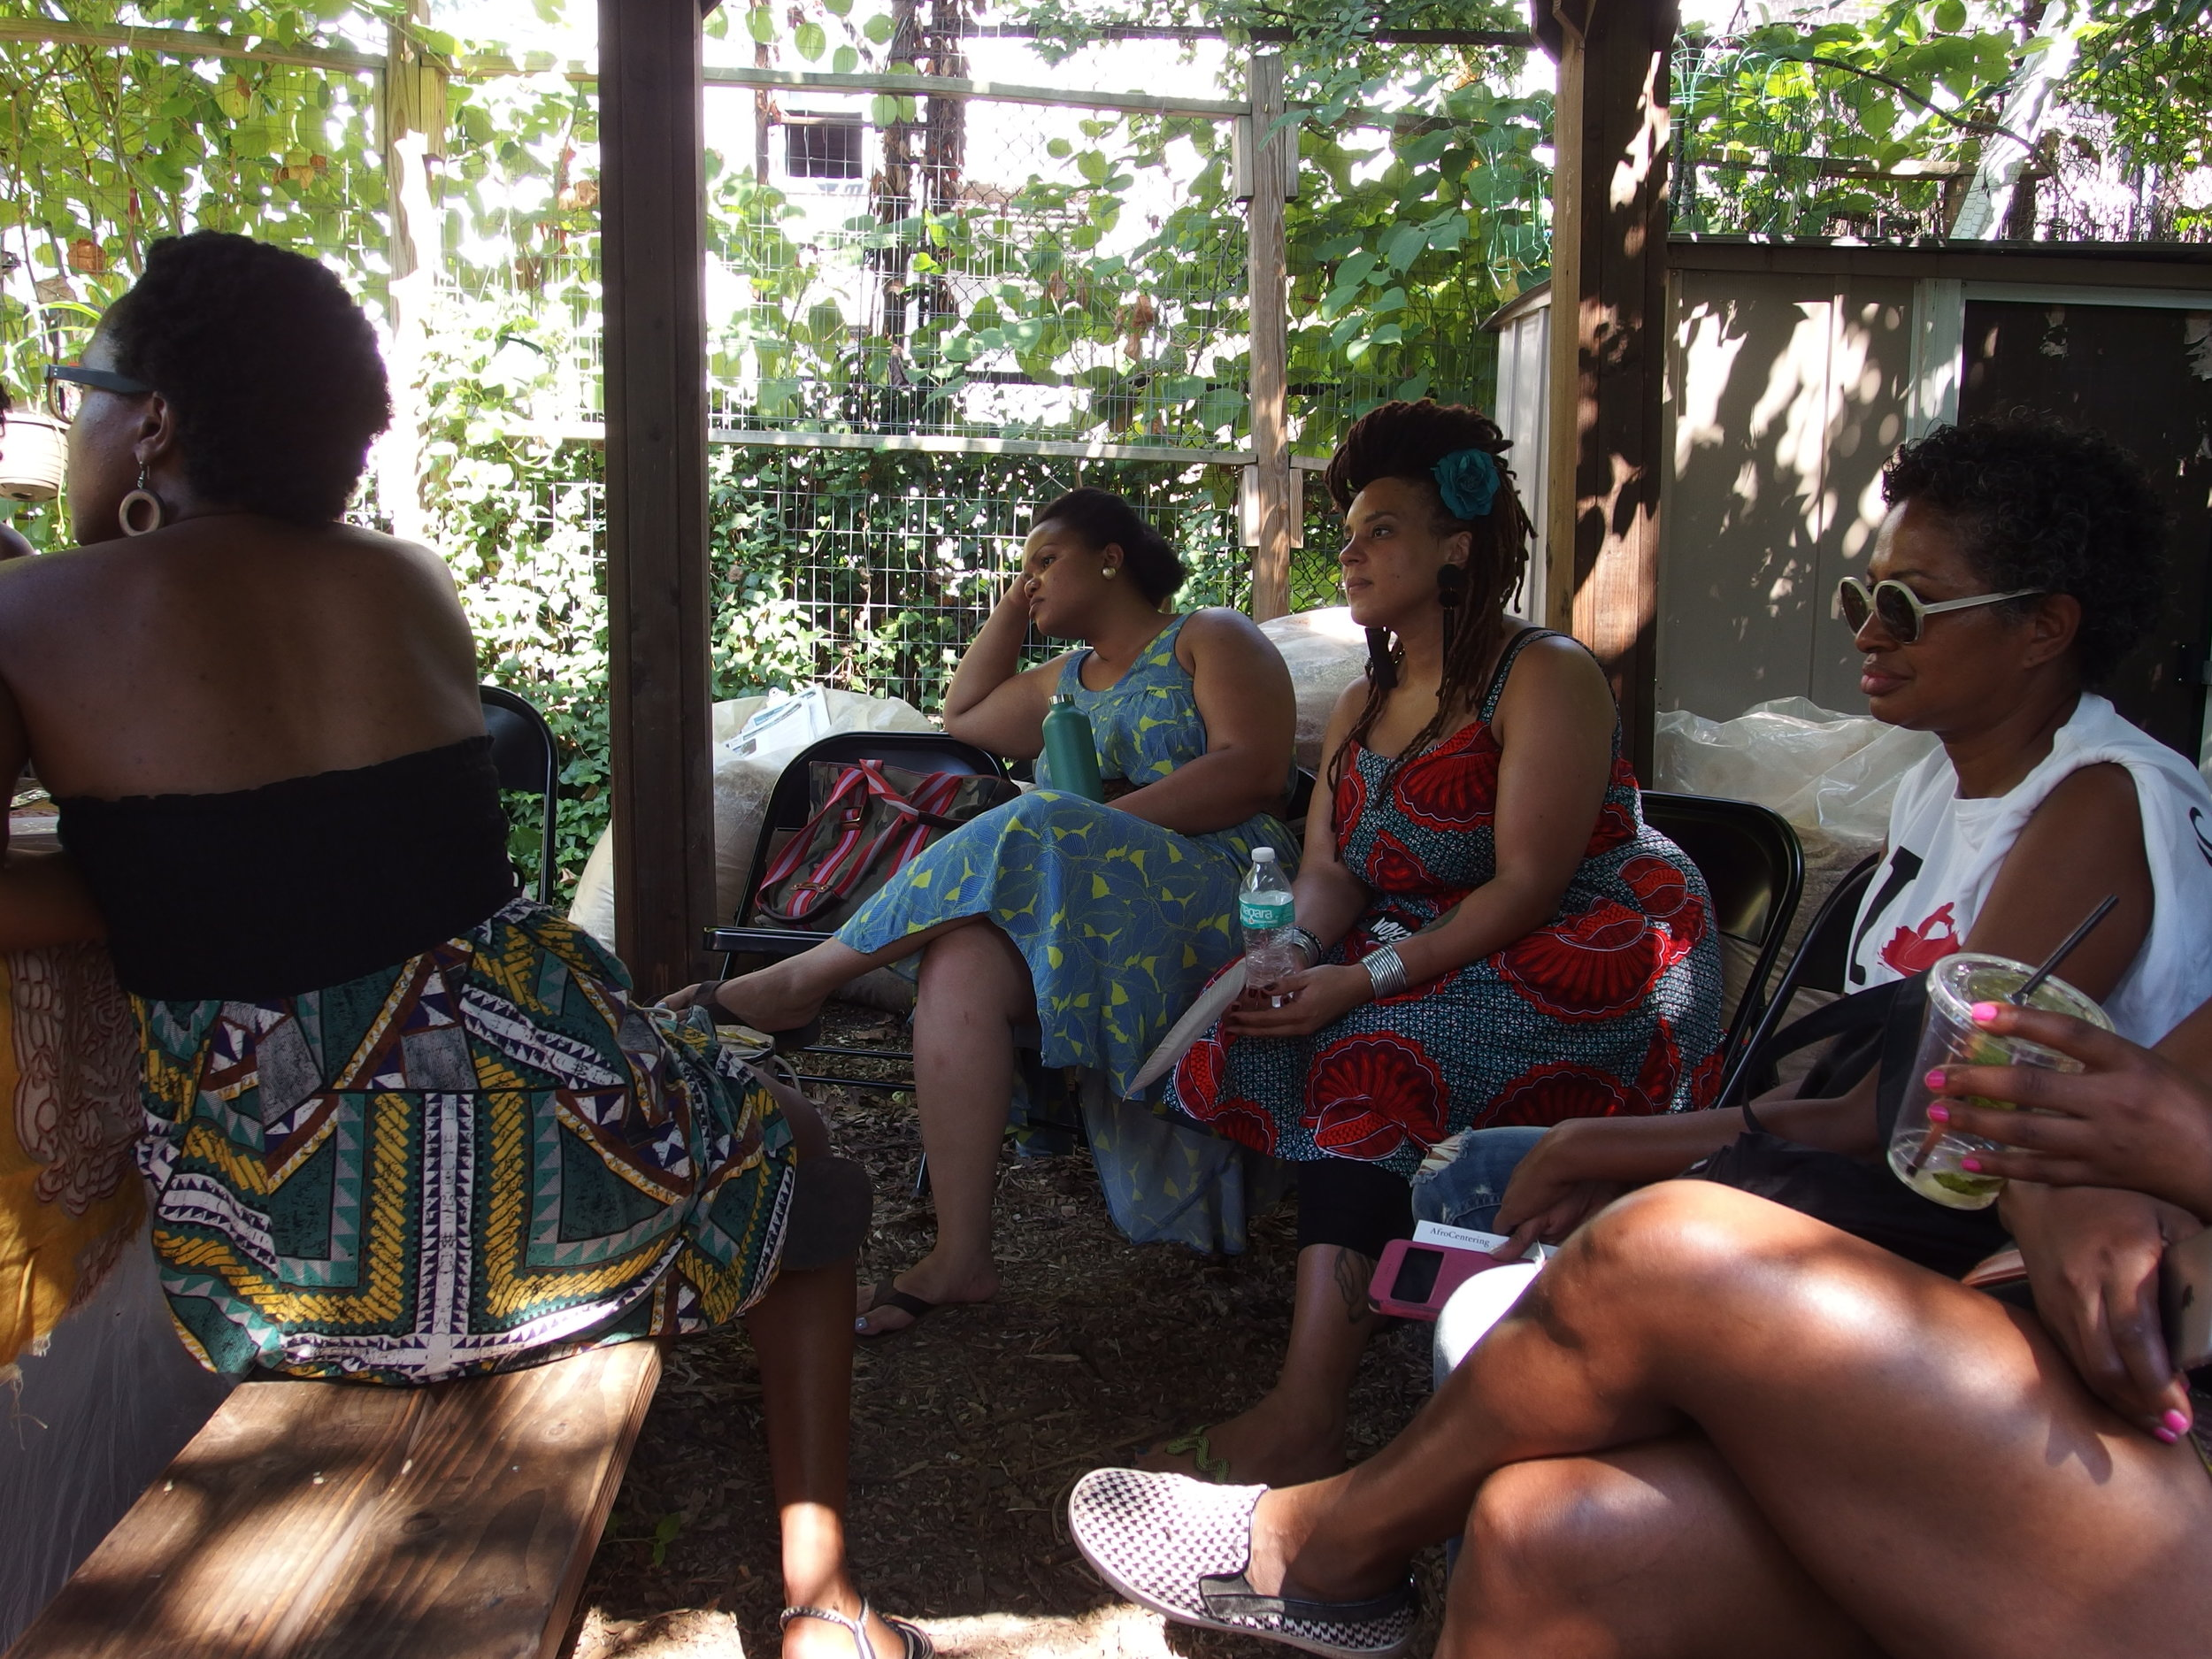 little-free-black-womens-library_20941332522_o.jpg